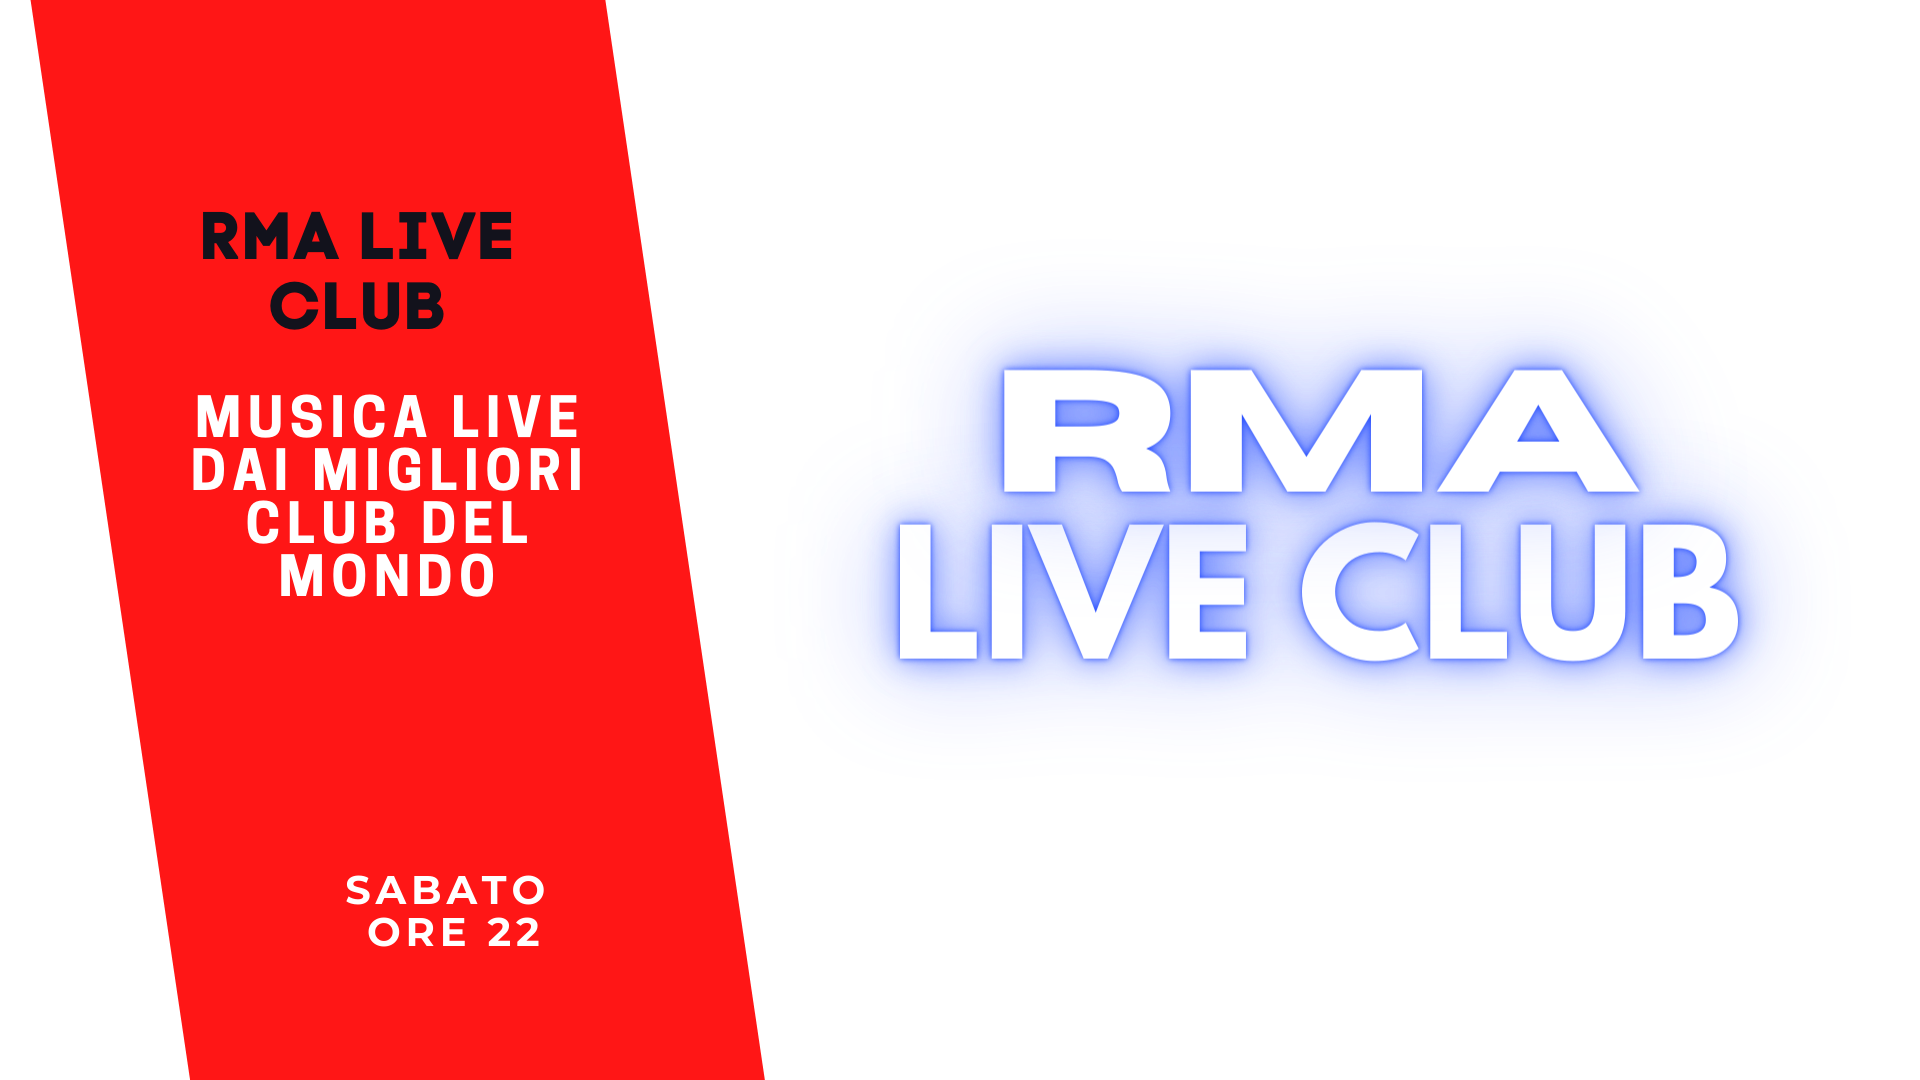 RMA LIVE CLUB